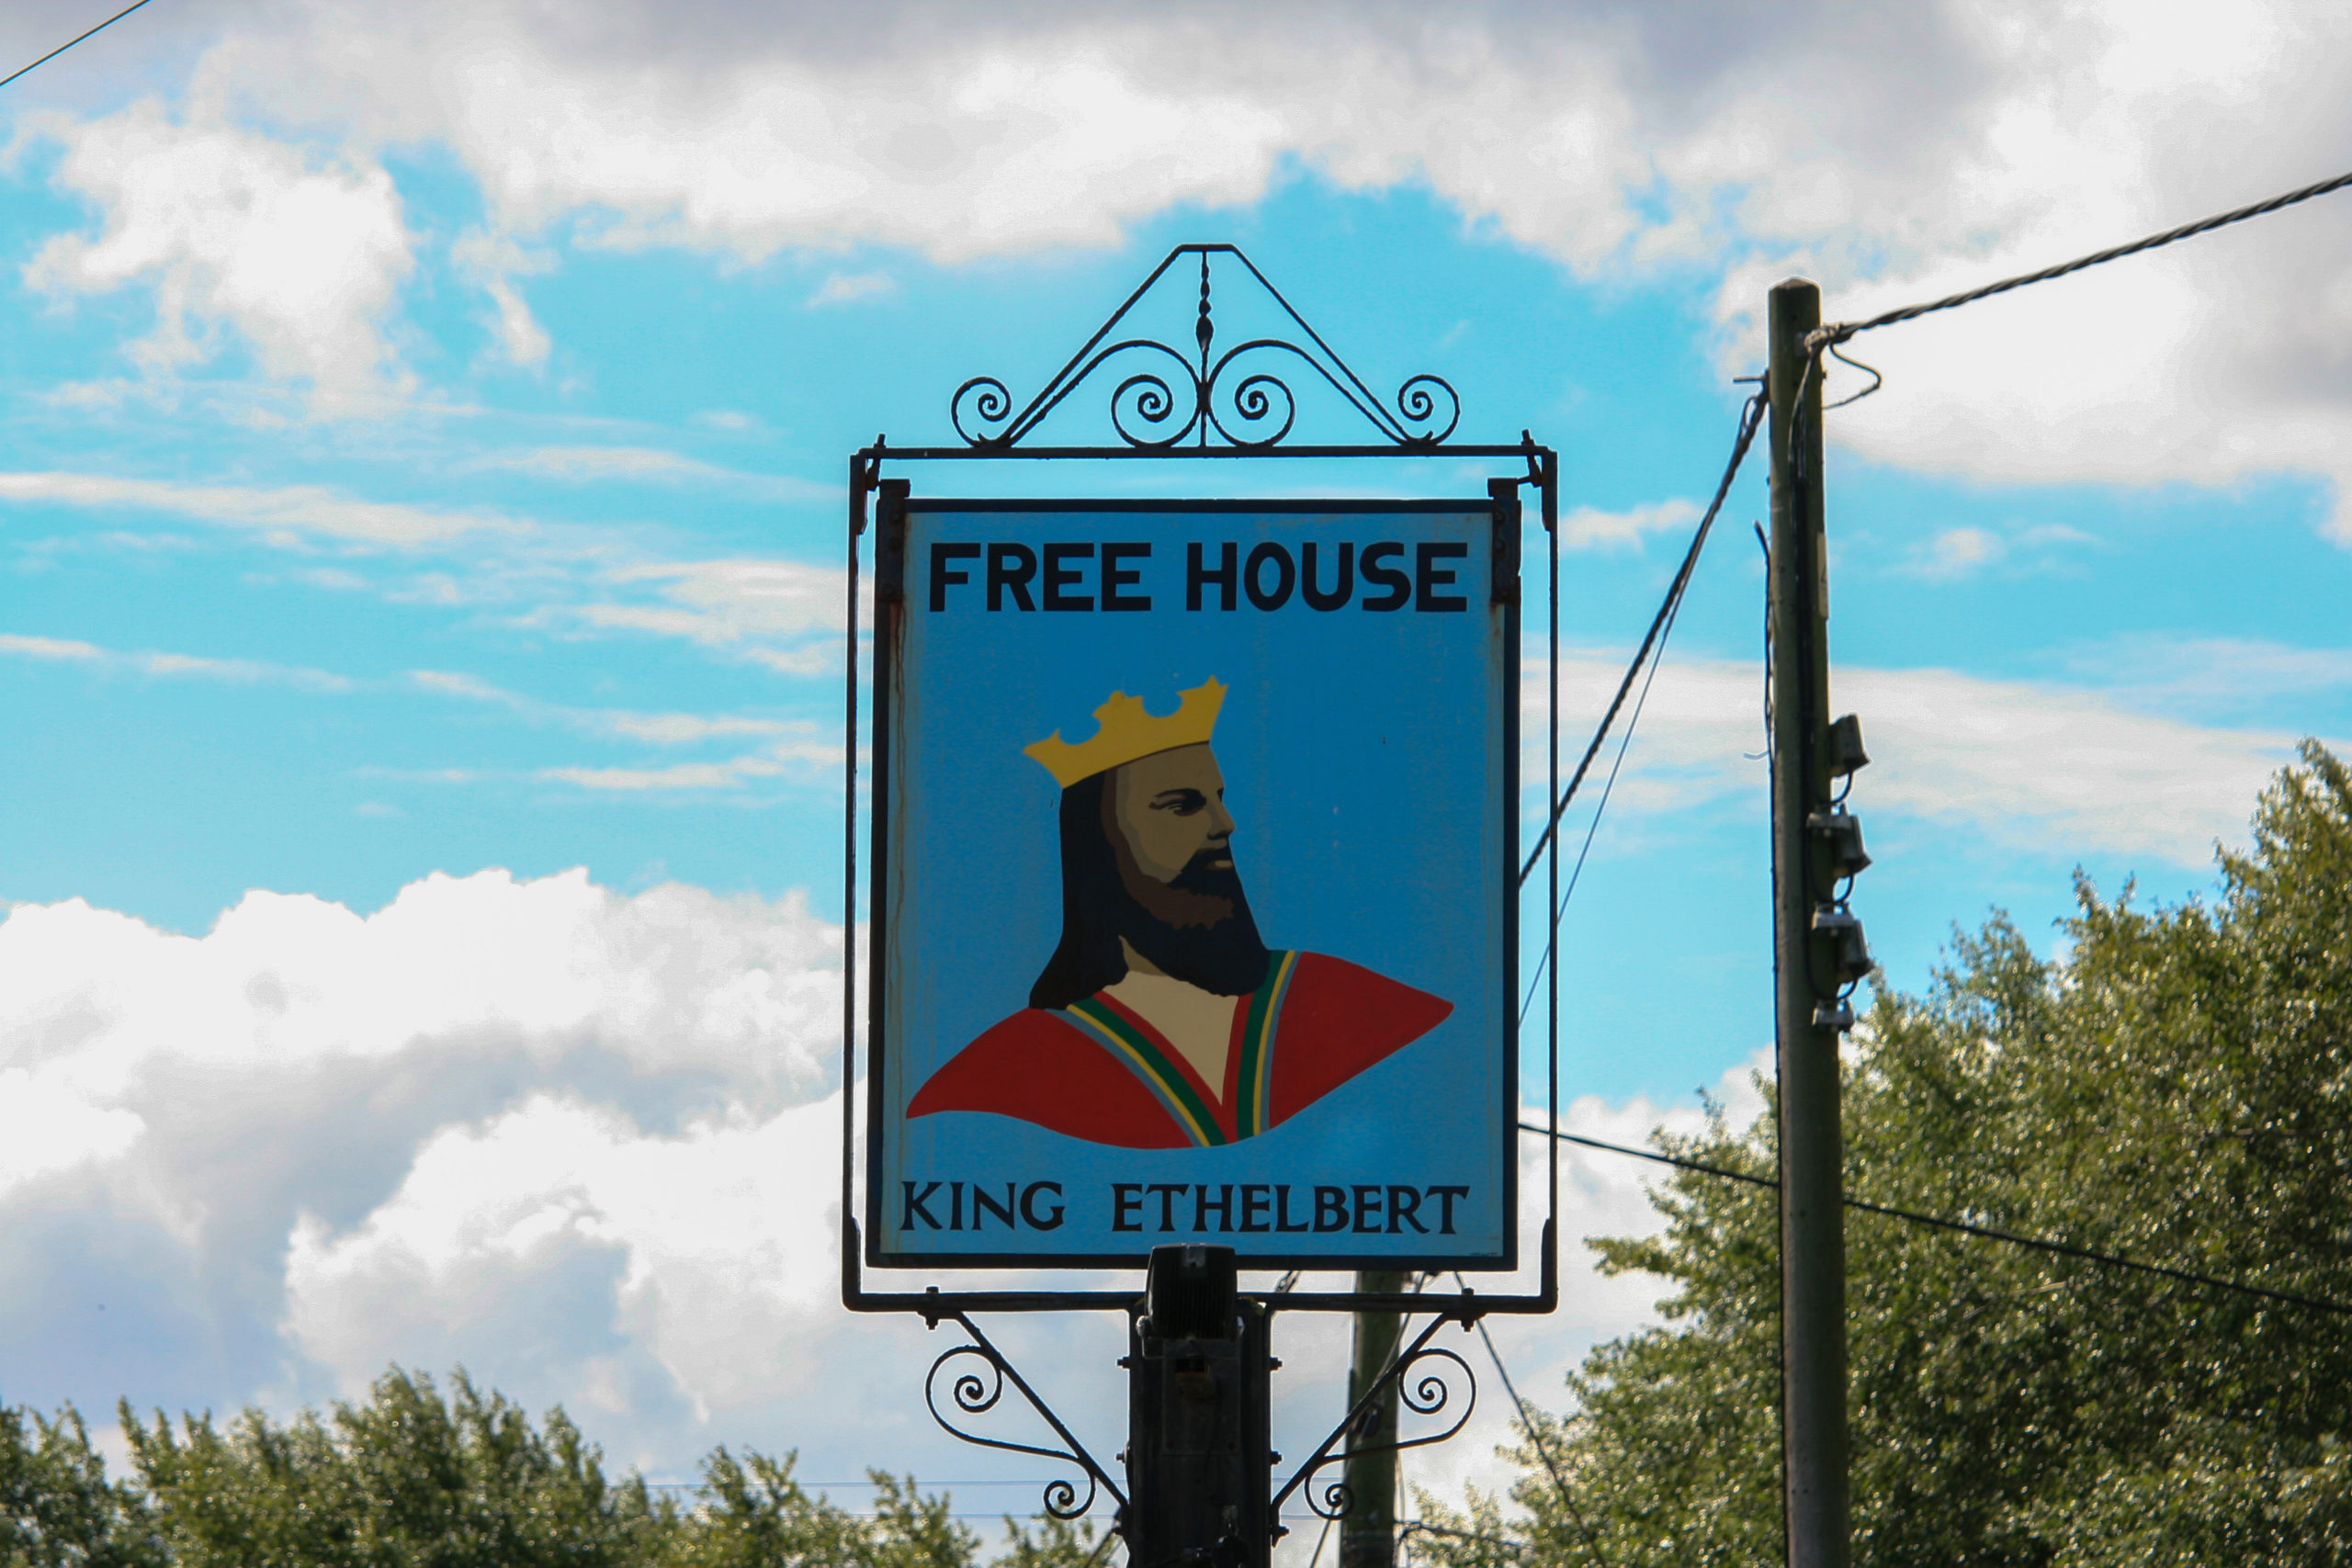 Free House King Ethelbert Reculver